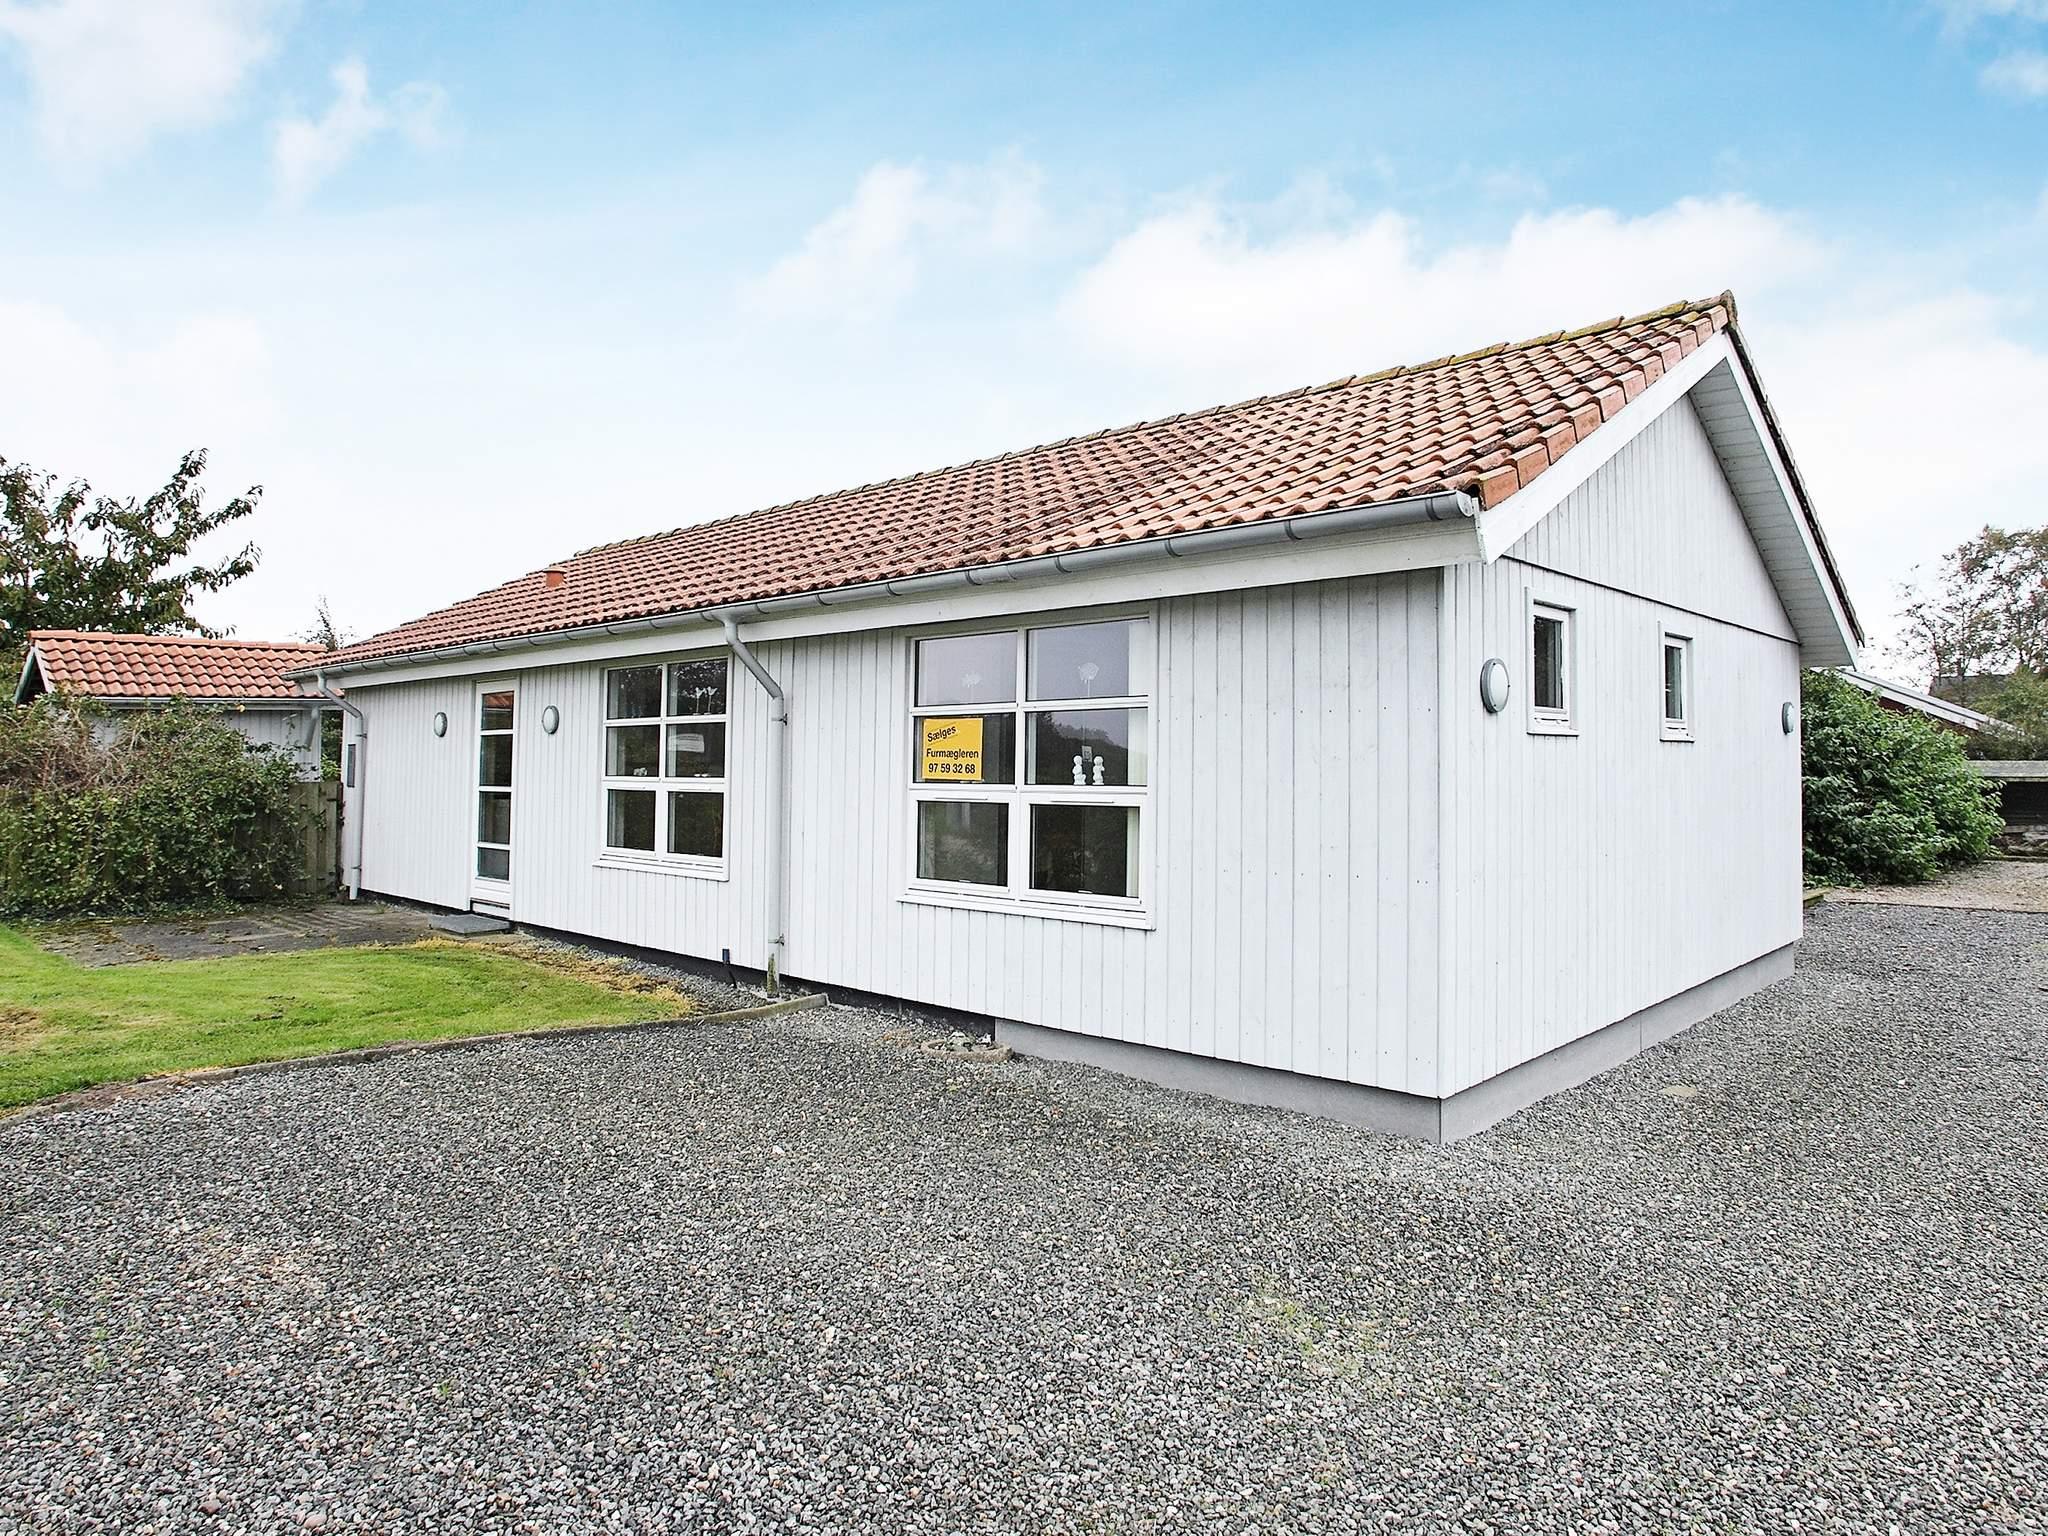 Ferienhaus Eskov Strandpark (1079937), Roslev, , Limfjord, Dänemark, Bild 13